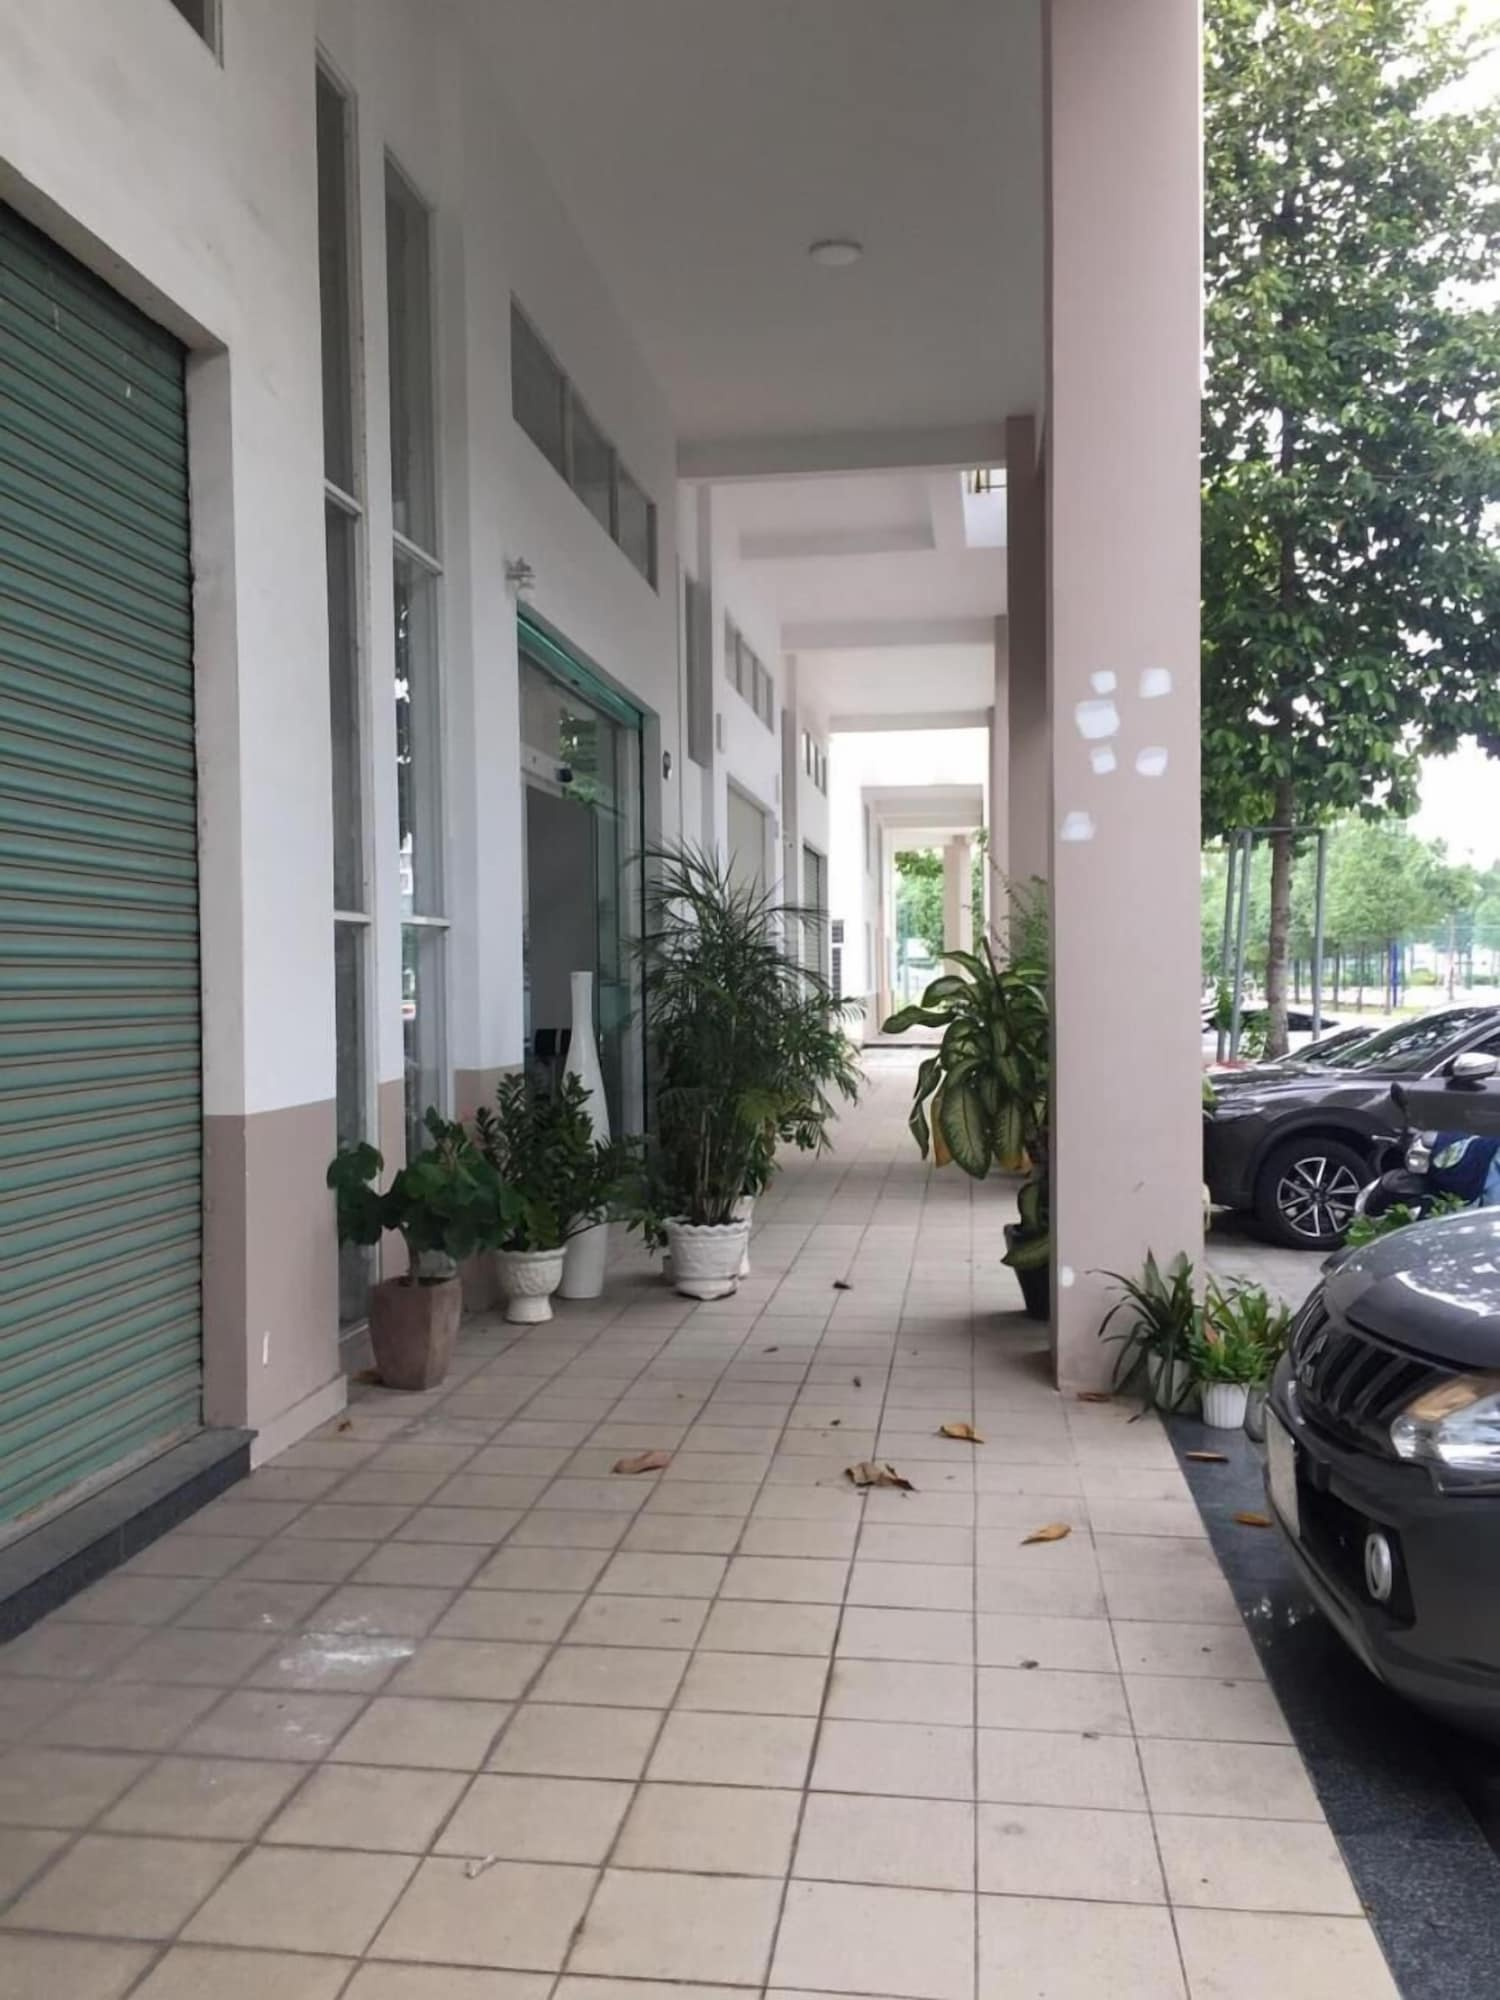 Binh Duong Hotel and Apartment, Tân Uyên